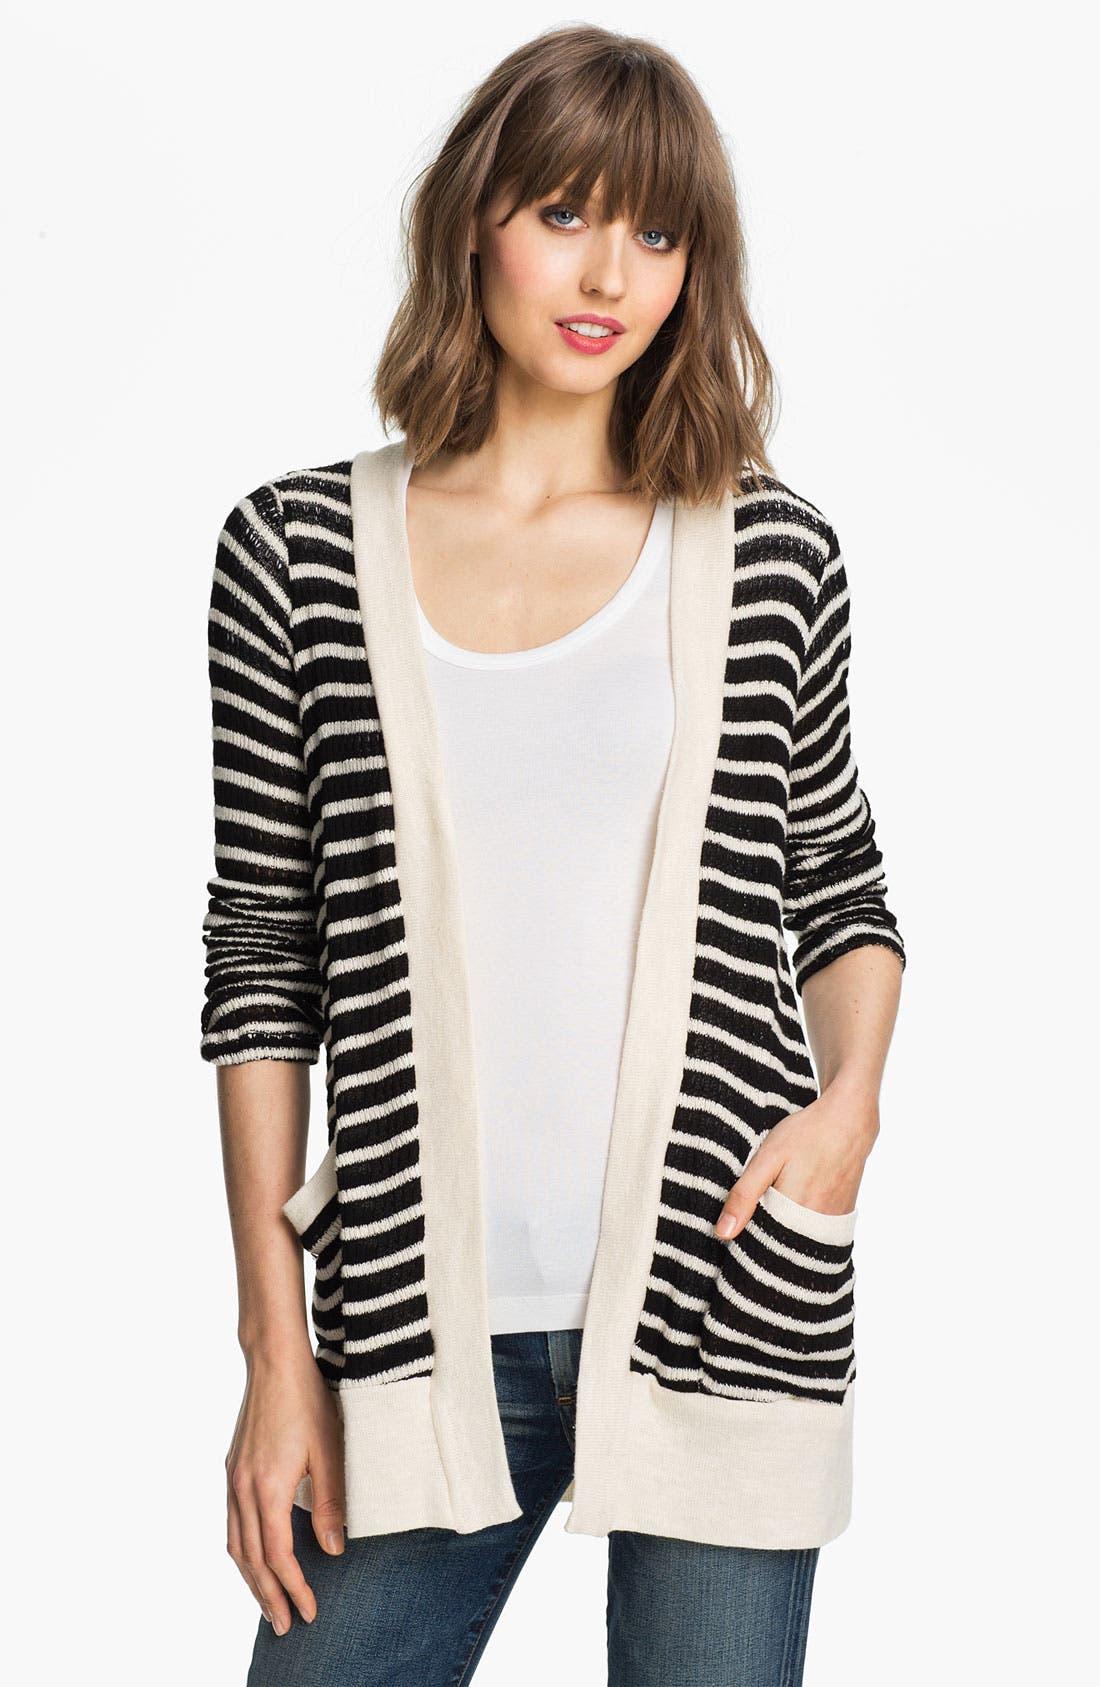 Alternate Image 1 Selected - Splendid 'Panama' Stripe Oversized Cardigan